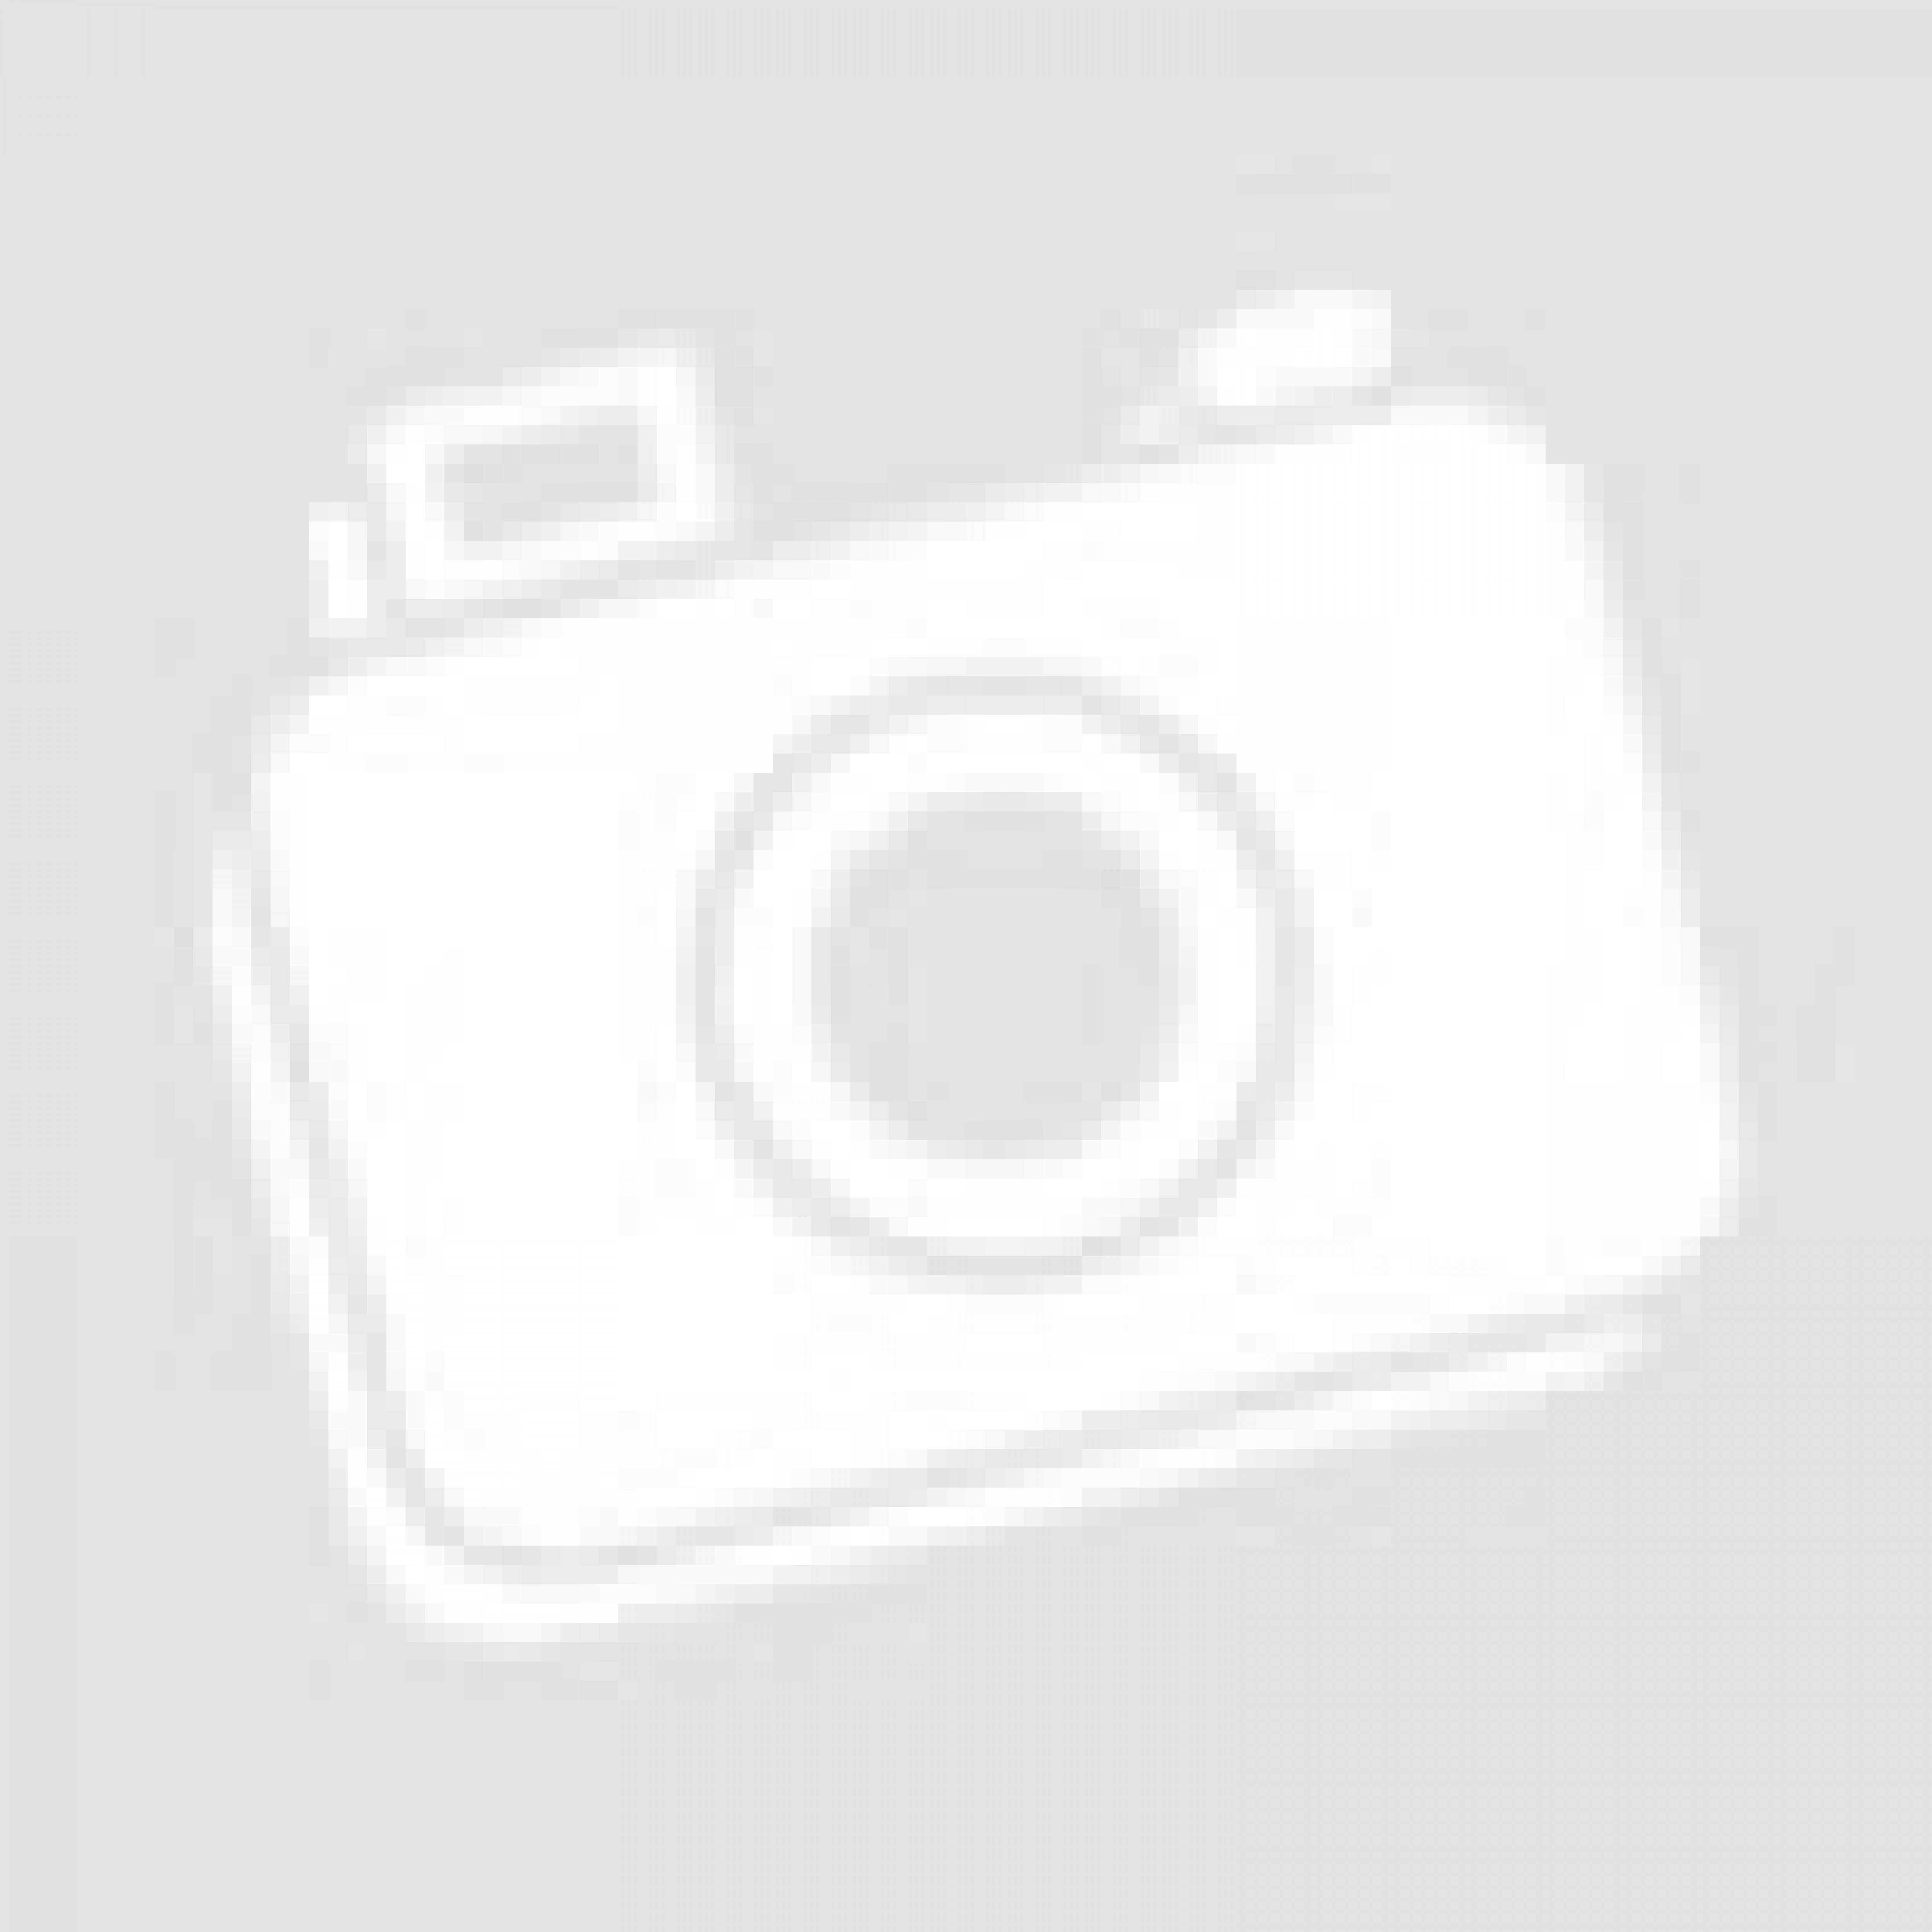 Новый suzuki baleno 2017-2018 цена, технические характеристики, фото и видео